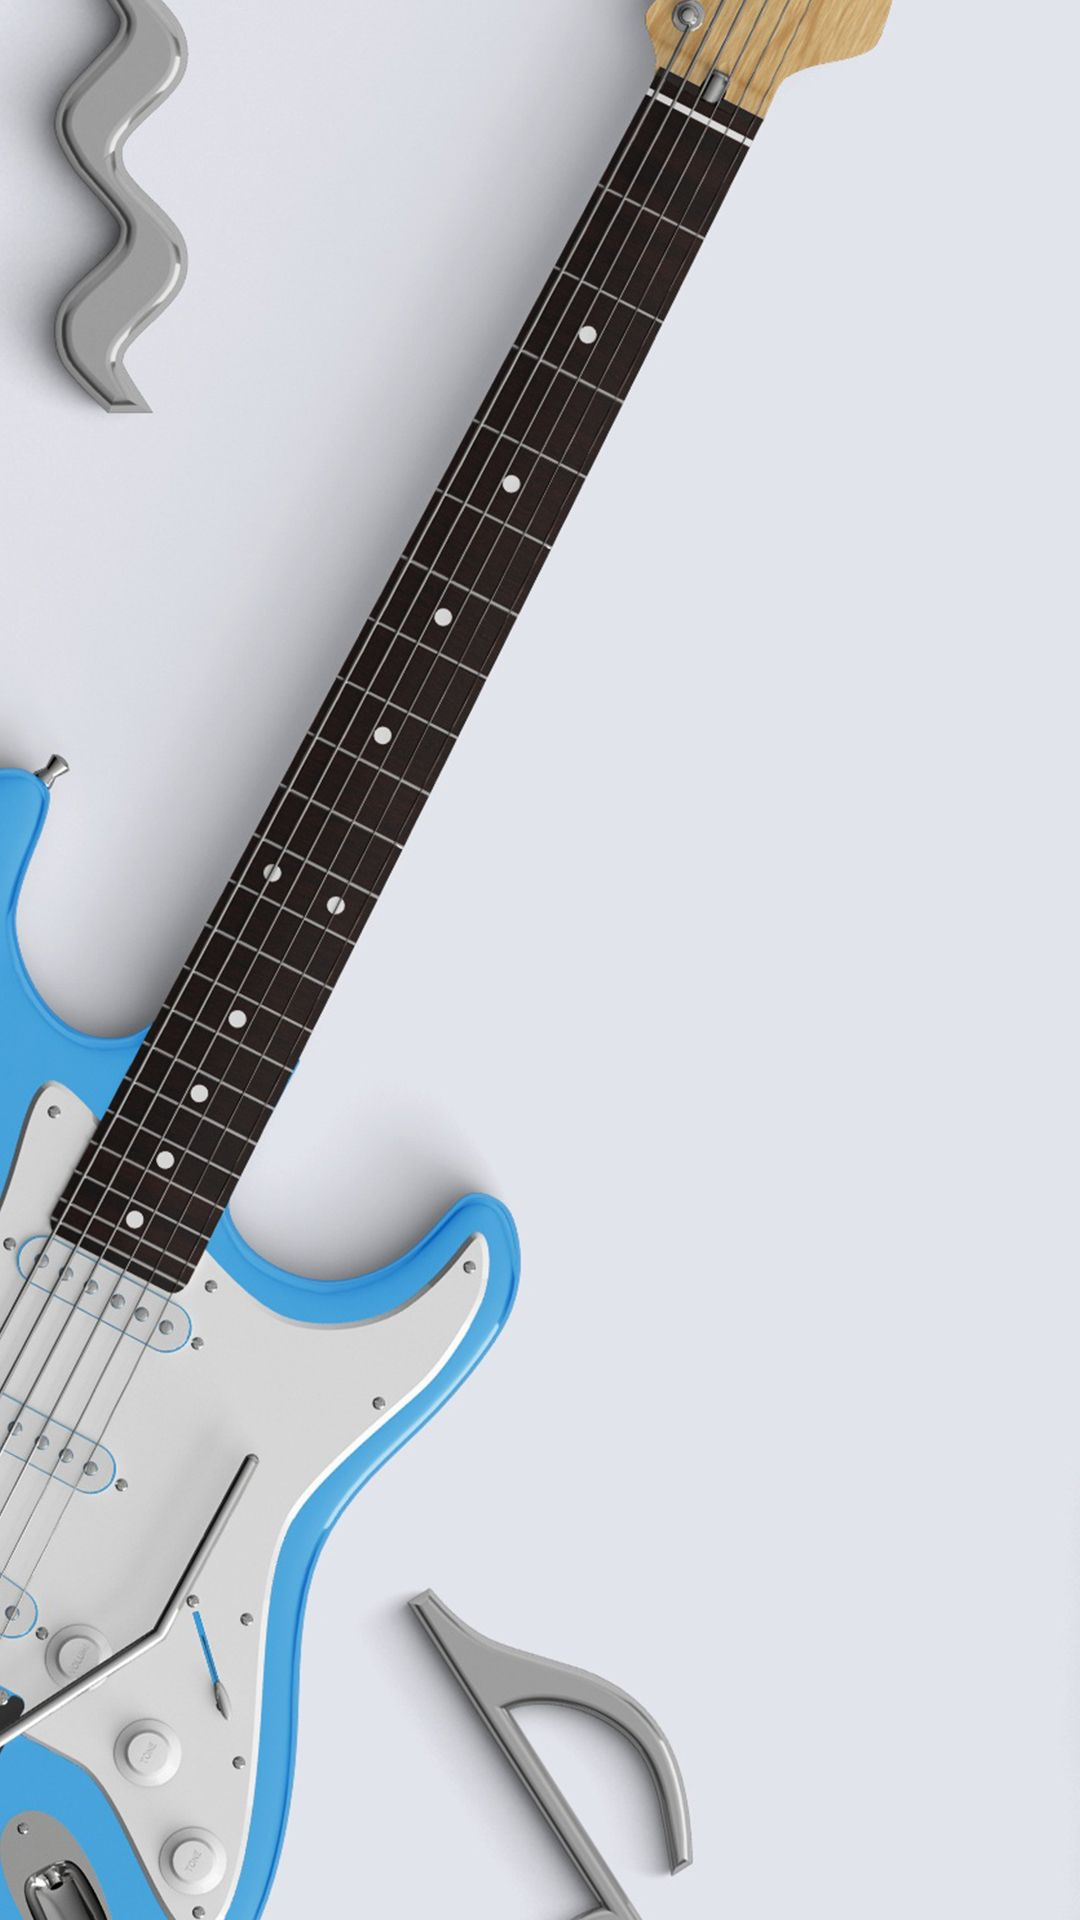 Guitar Smartphone Wallpapers Top Free Guitar Smartphone Backgrounds Wallpaperaccess